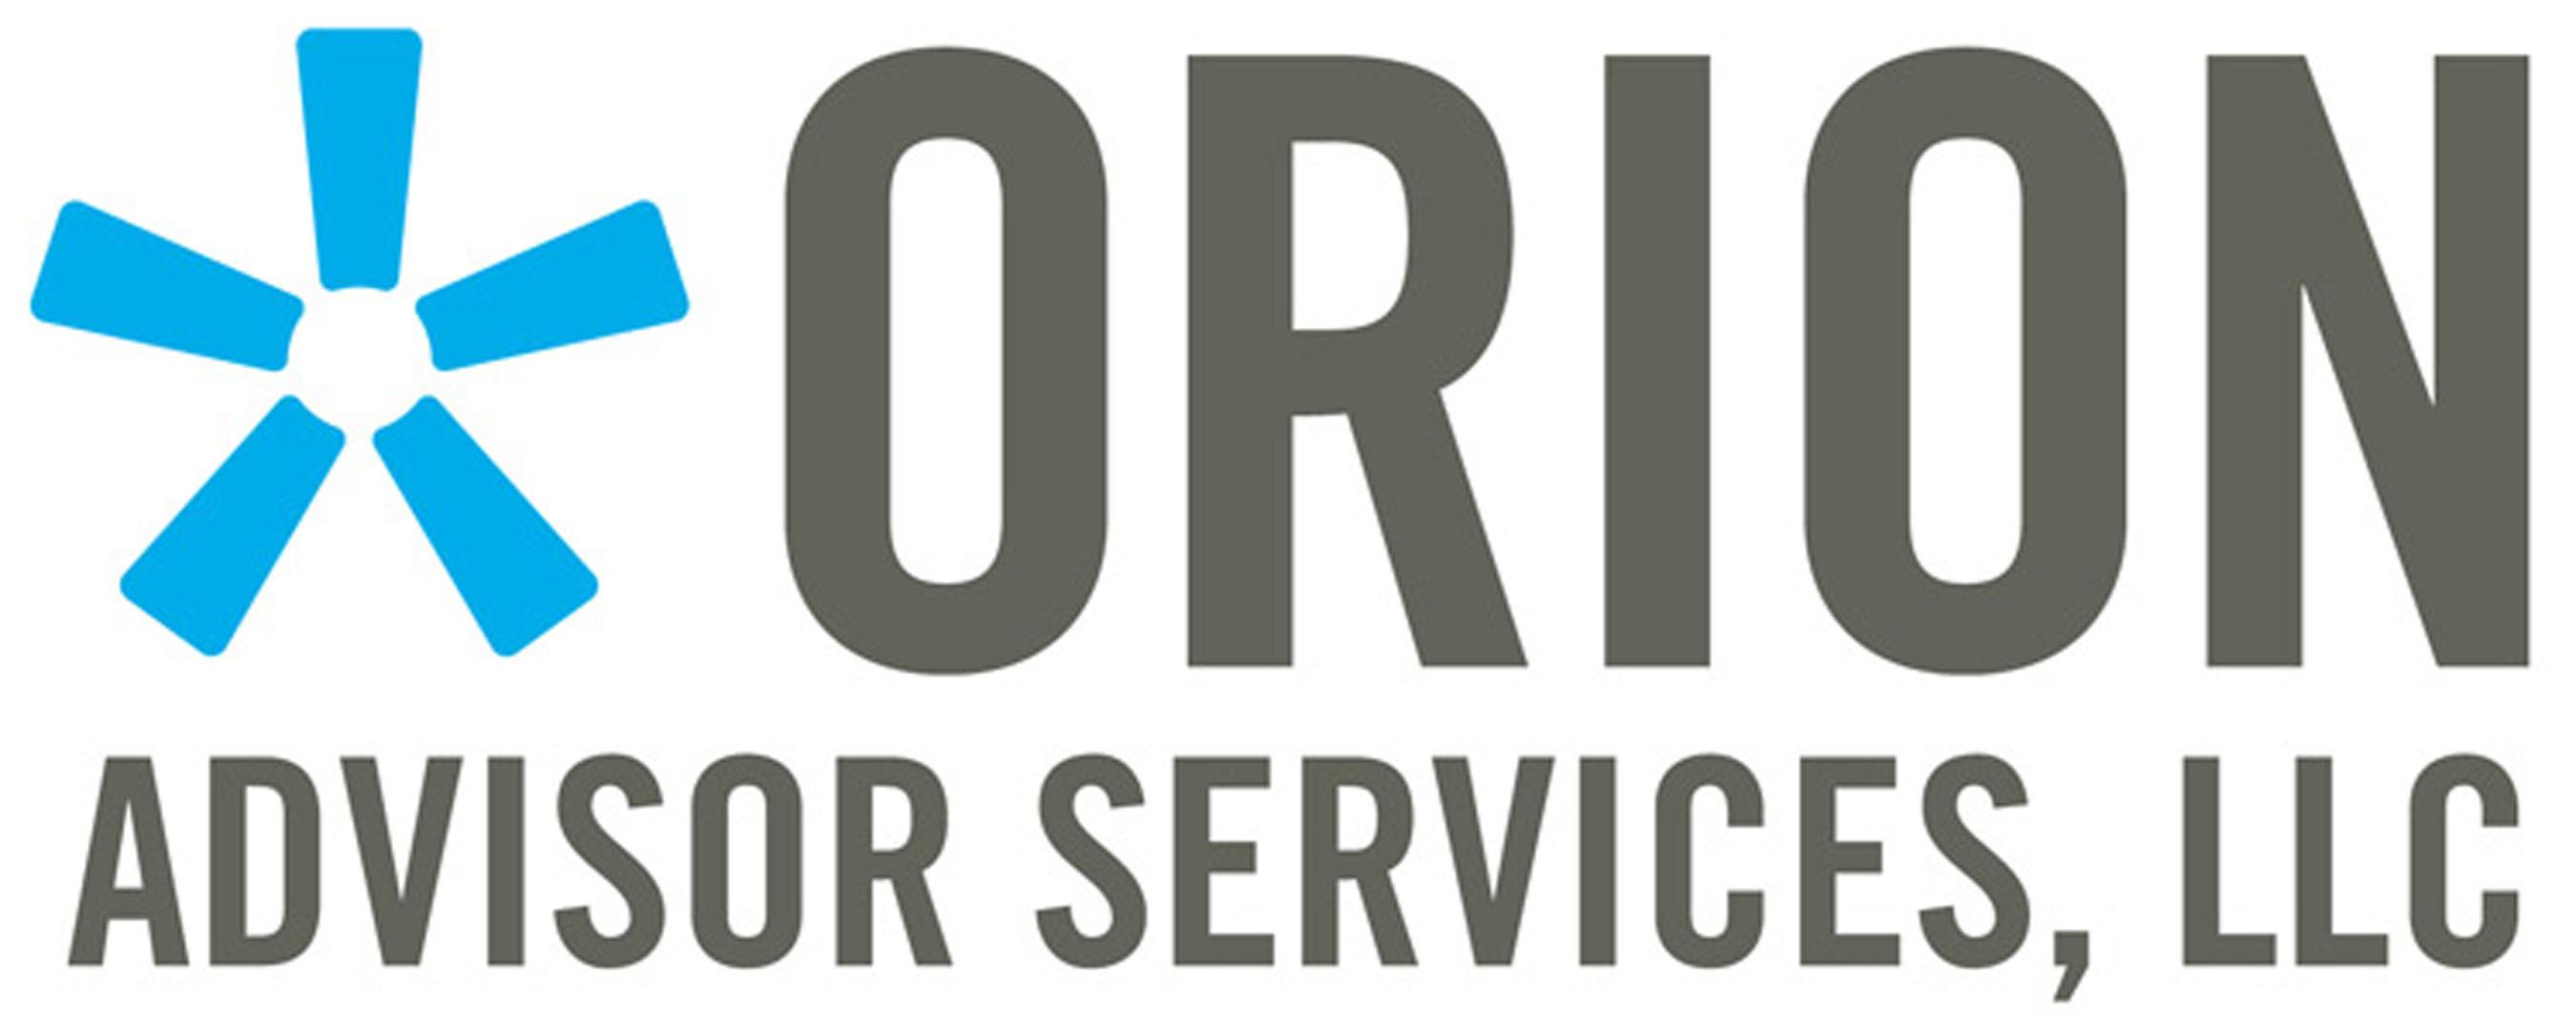 Orion Advisor Services, LLC. (PRNewsFoto/Orion Advisor Services, LLC) (PRNewsFoto/ORION ADVISOR SERVICES, LLC)